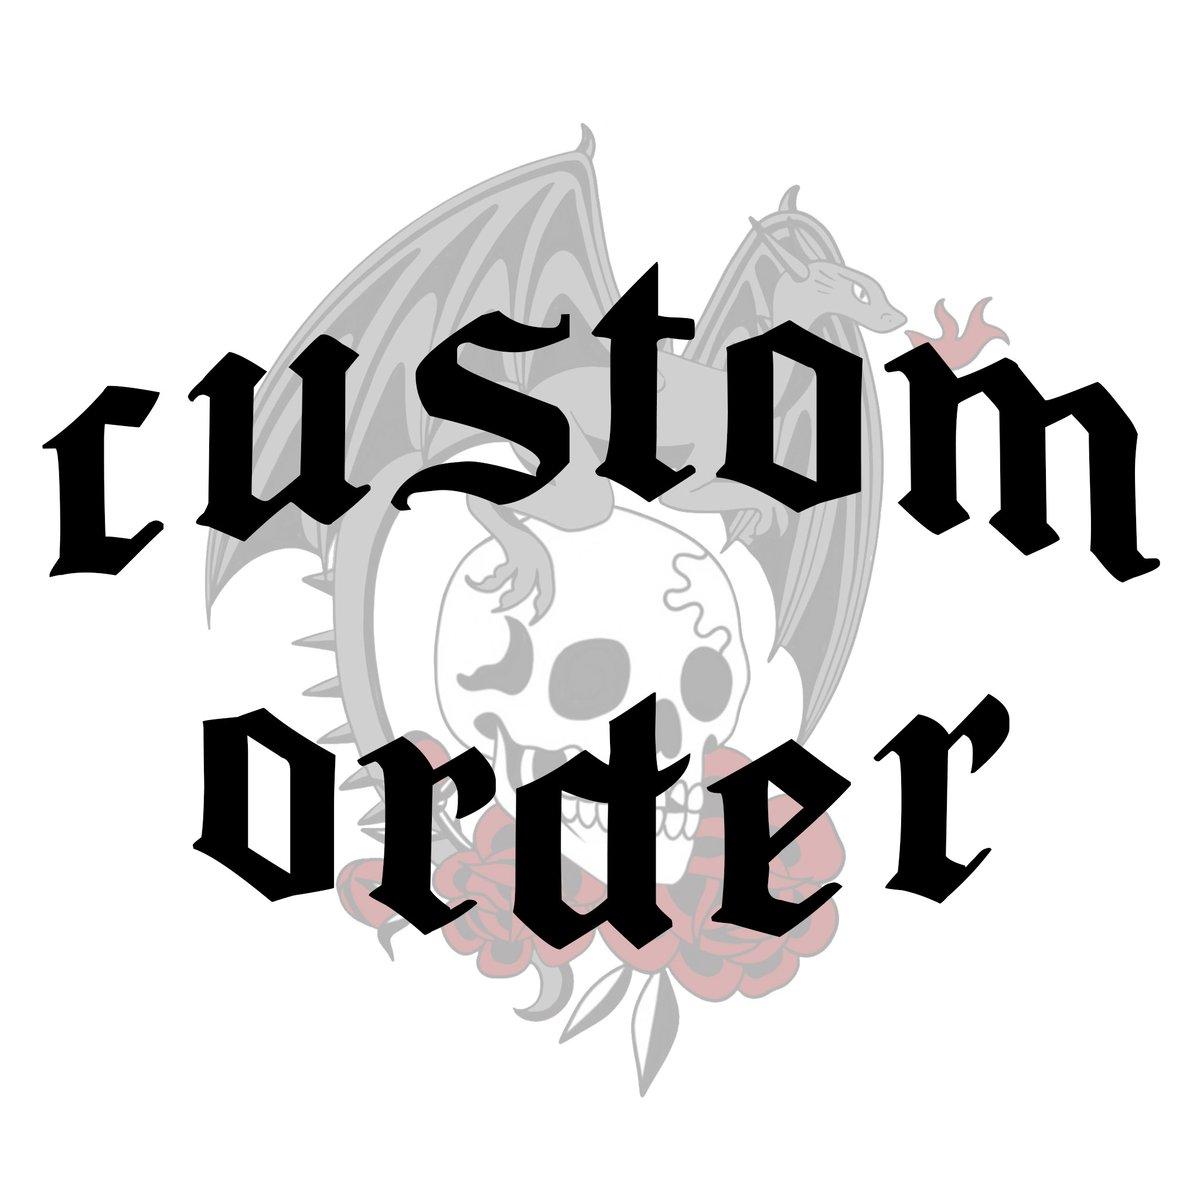 Custom Order Payment / Tip